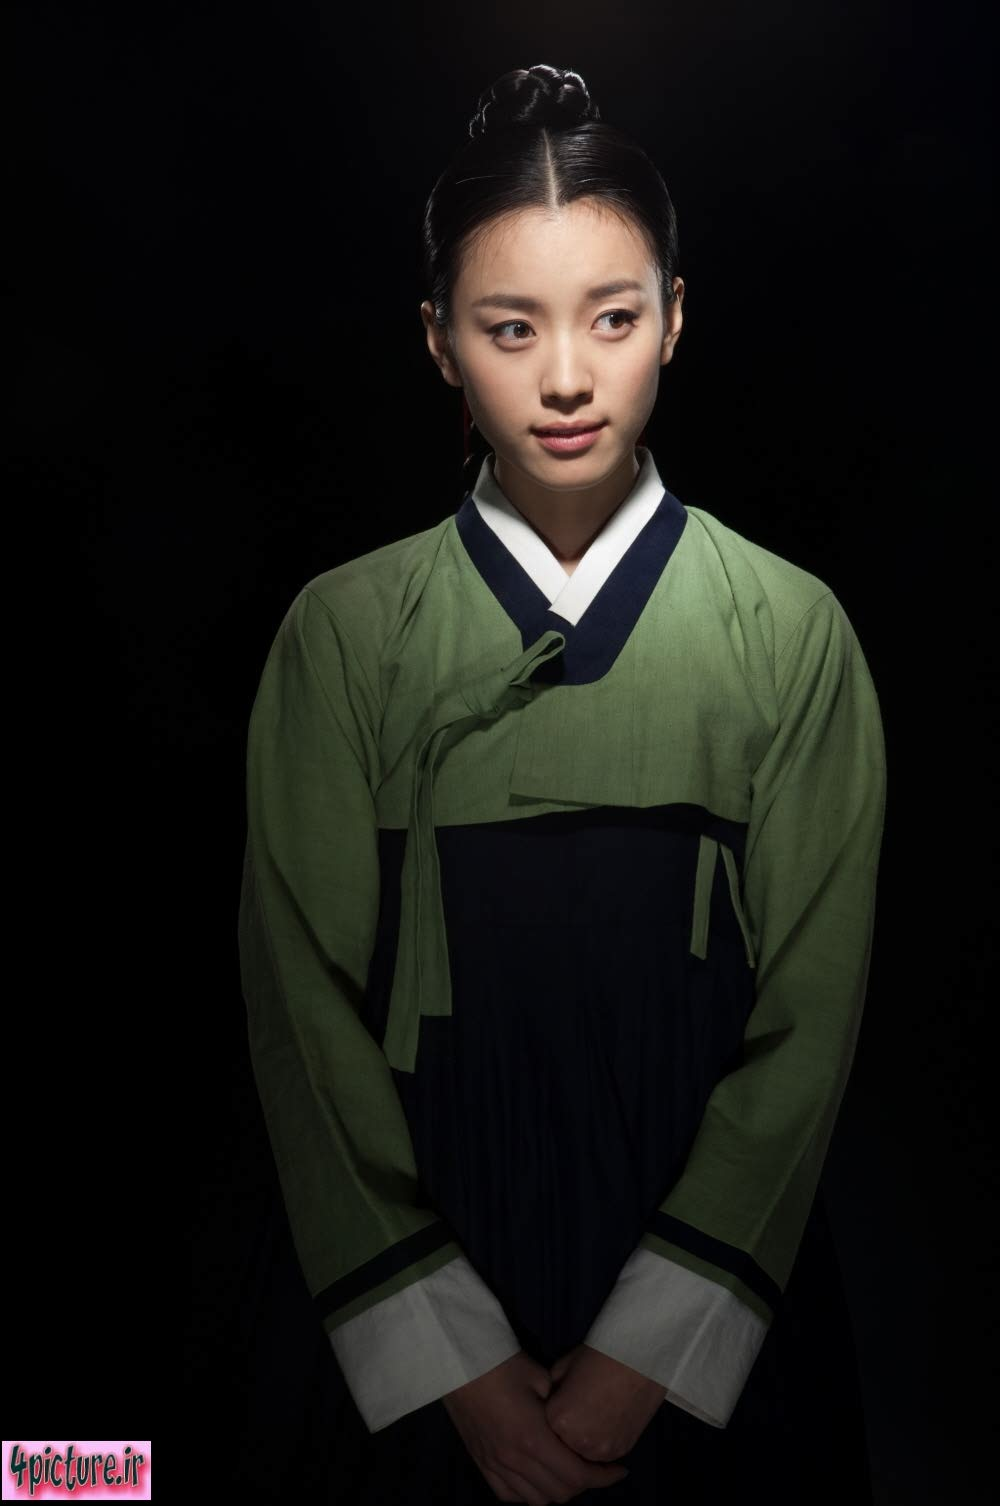 dongi عکس دونگی دانگ یی dongii,donge,dongy